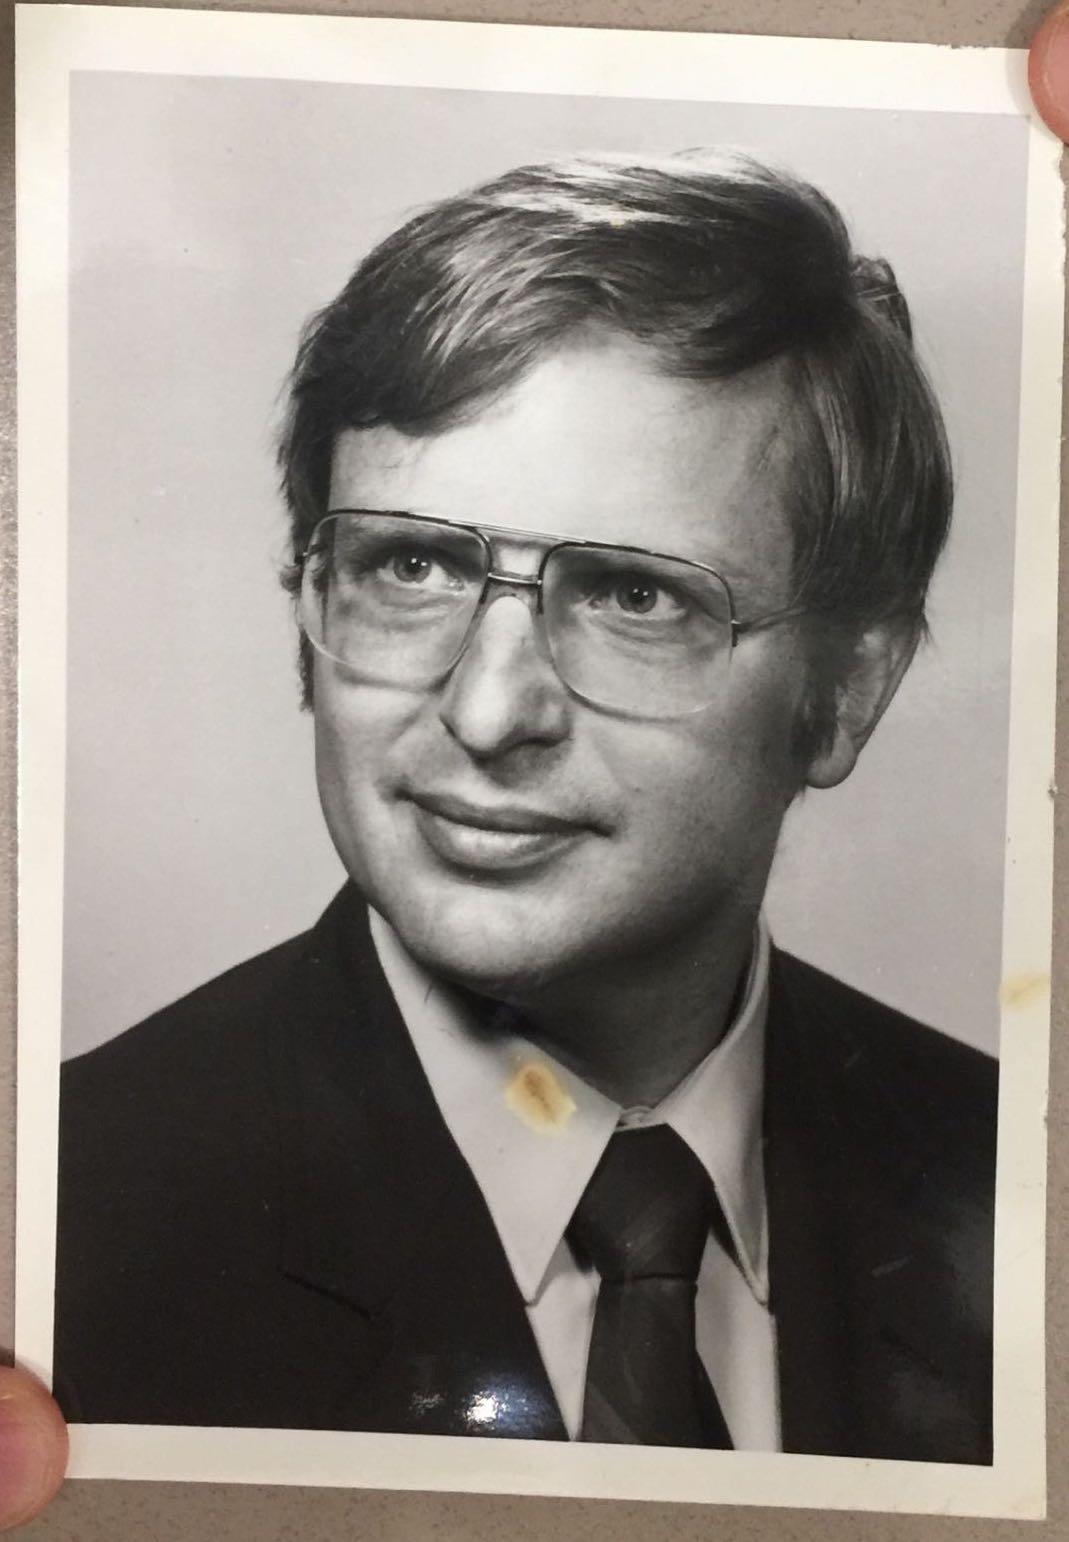 Master Graduation Photo (1967)